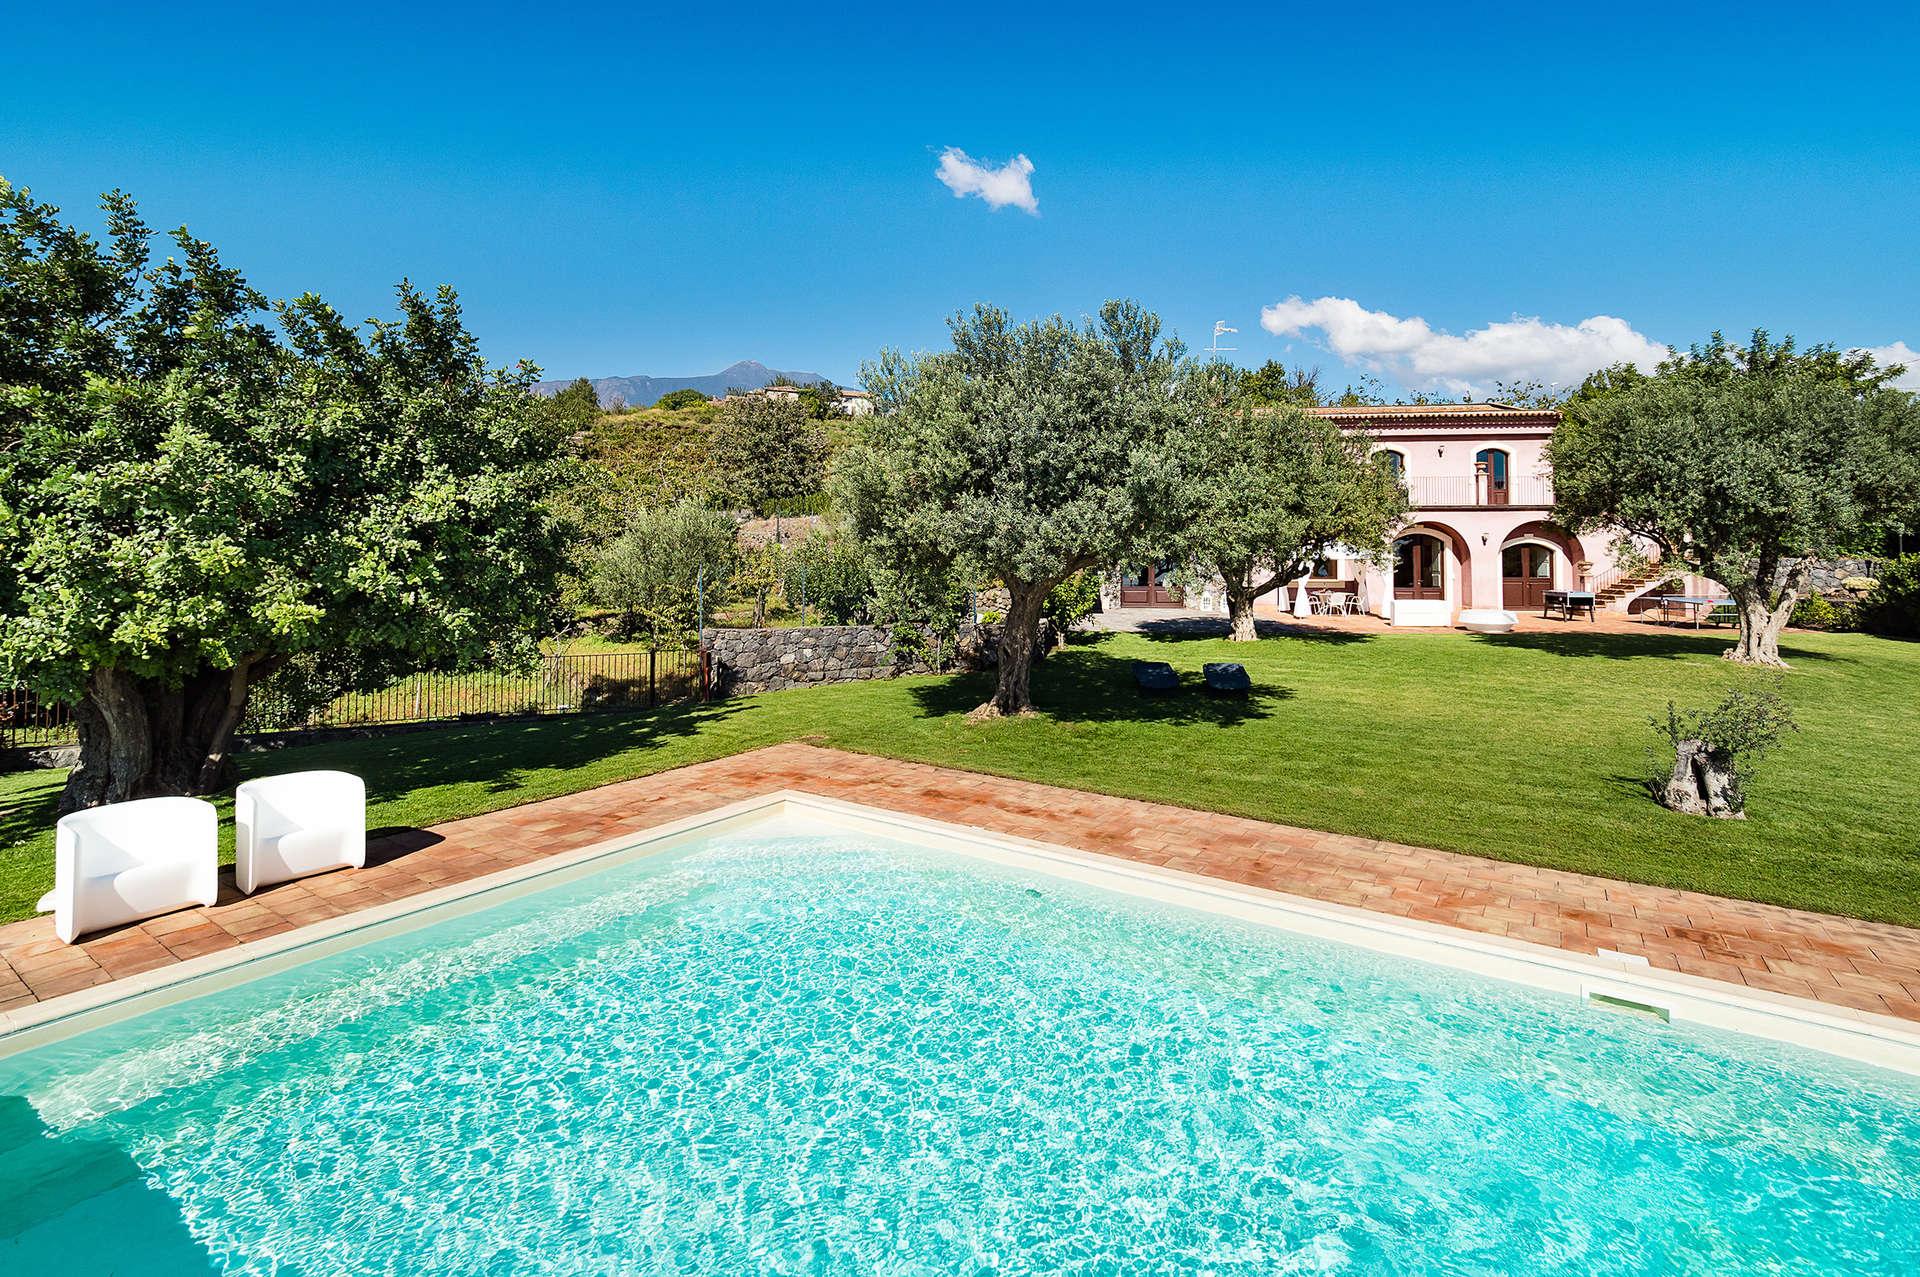 Luxury vacation rentals europe - Italy - Sicily - Milo - Mila - Image 1/53